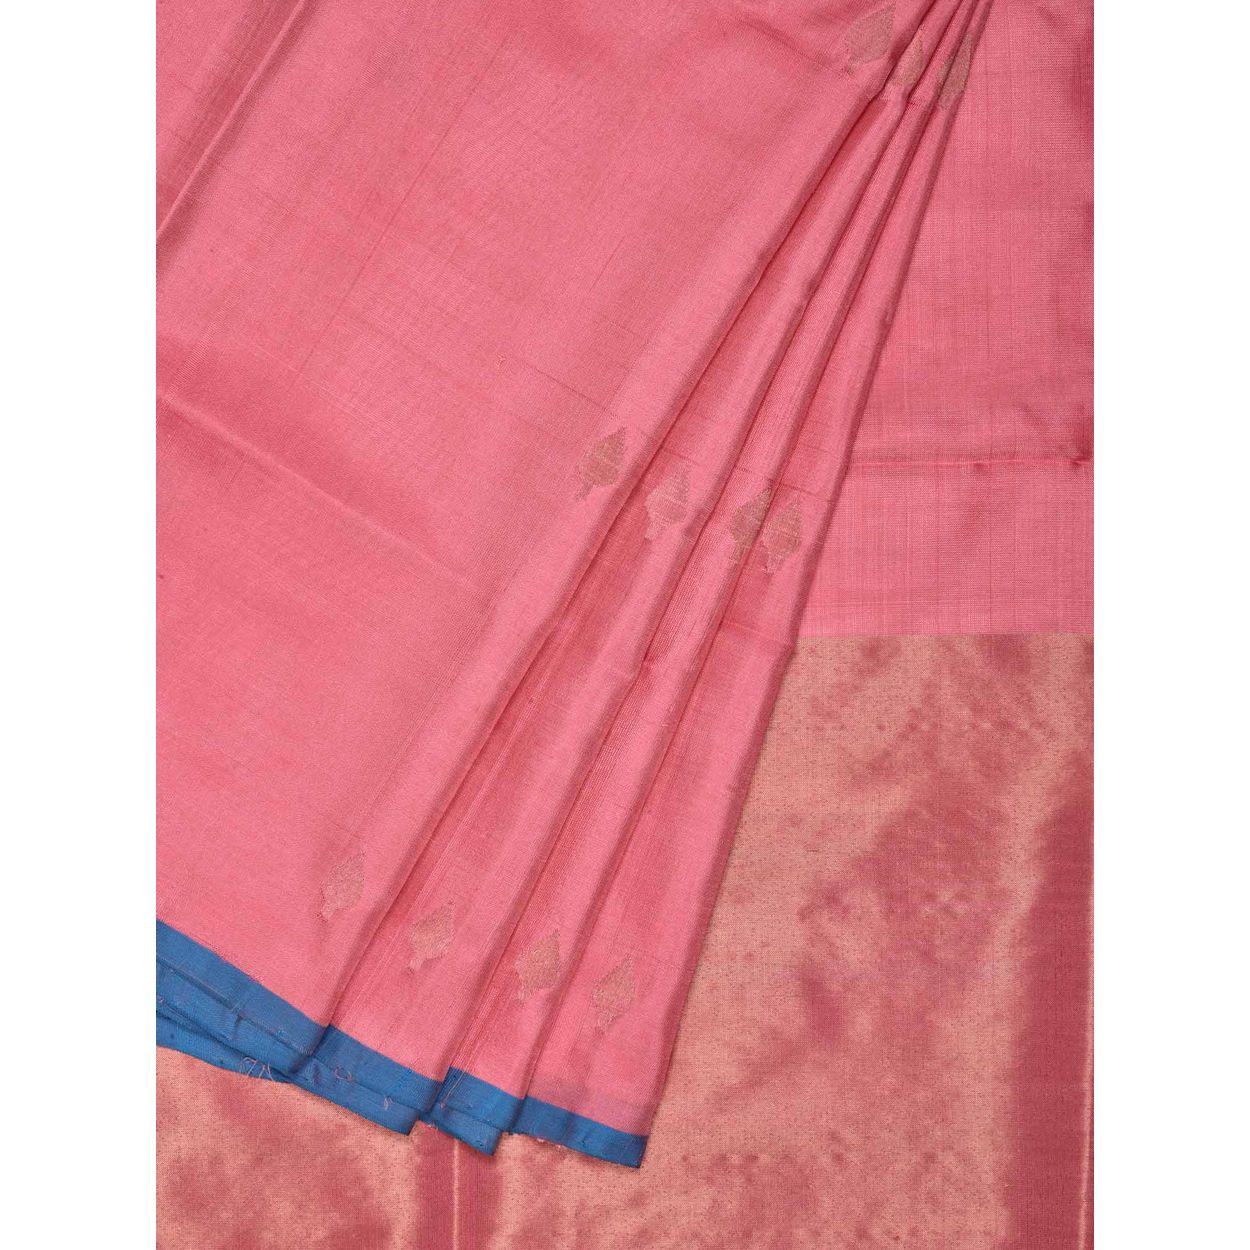 e928677dc9 Baby Pink Color Sari | Uppada Silk Handloom Saree u1508